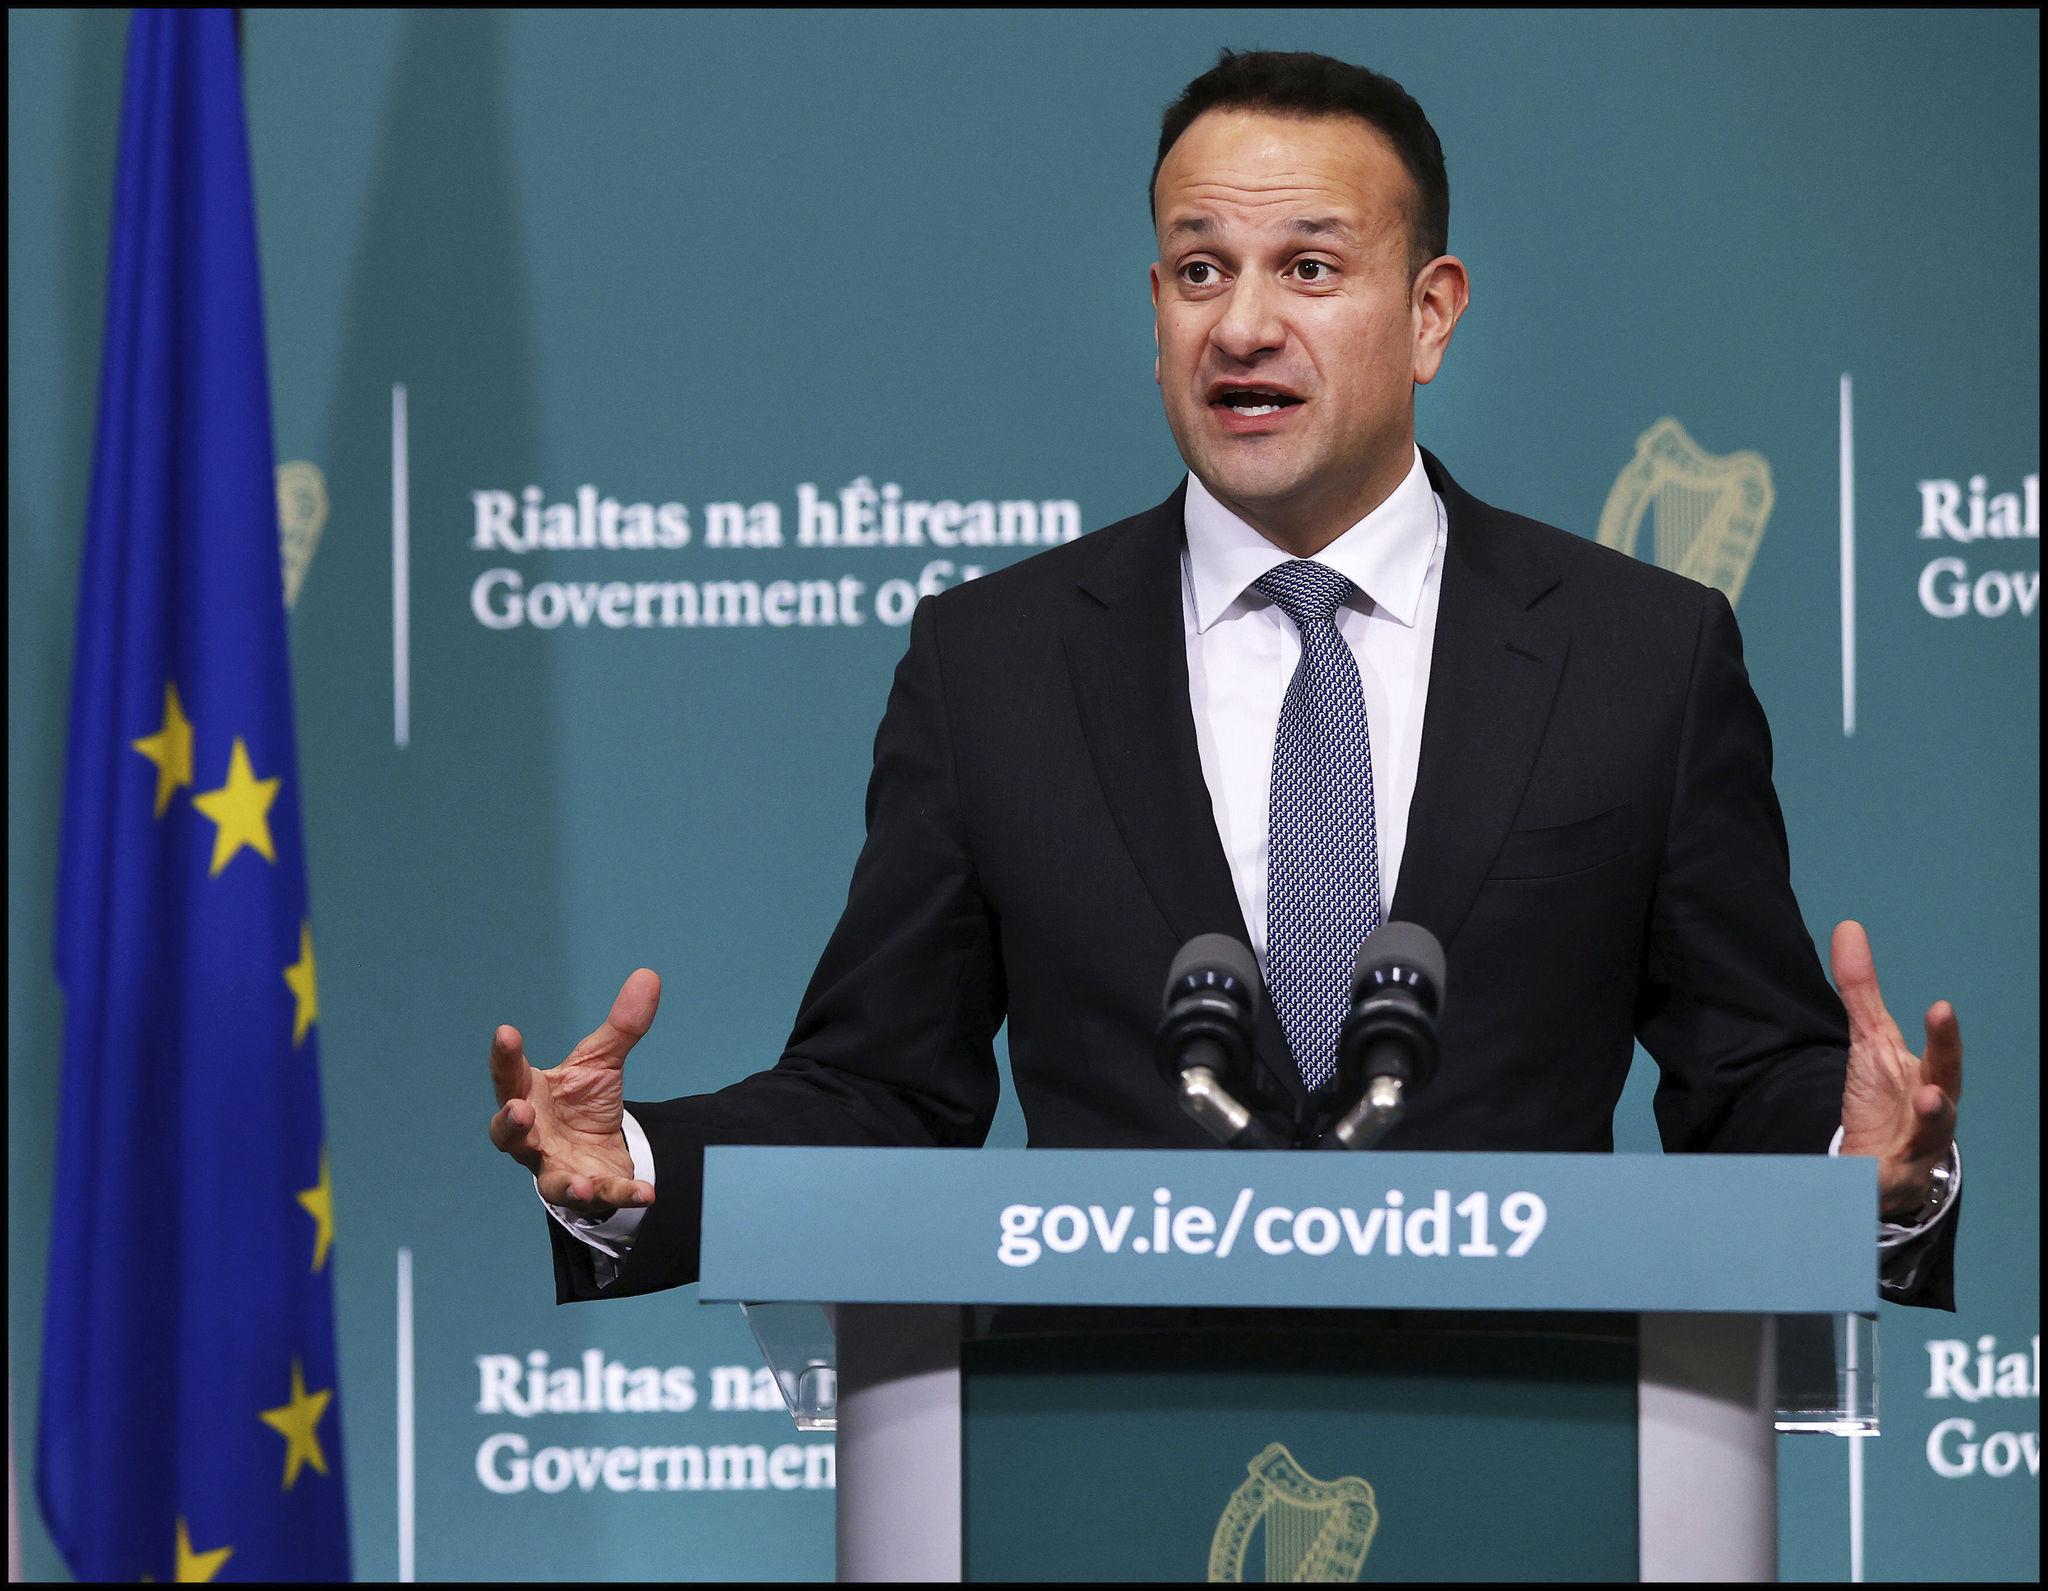 Irish prime minister to return to work as doctor during coronavirus pandemic